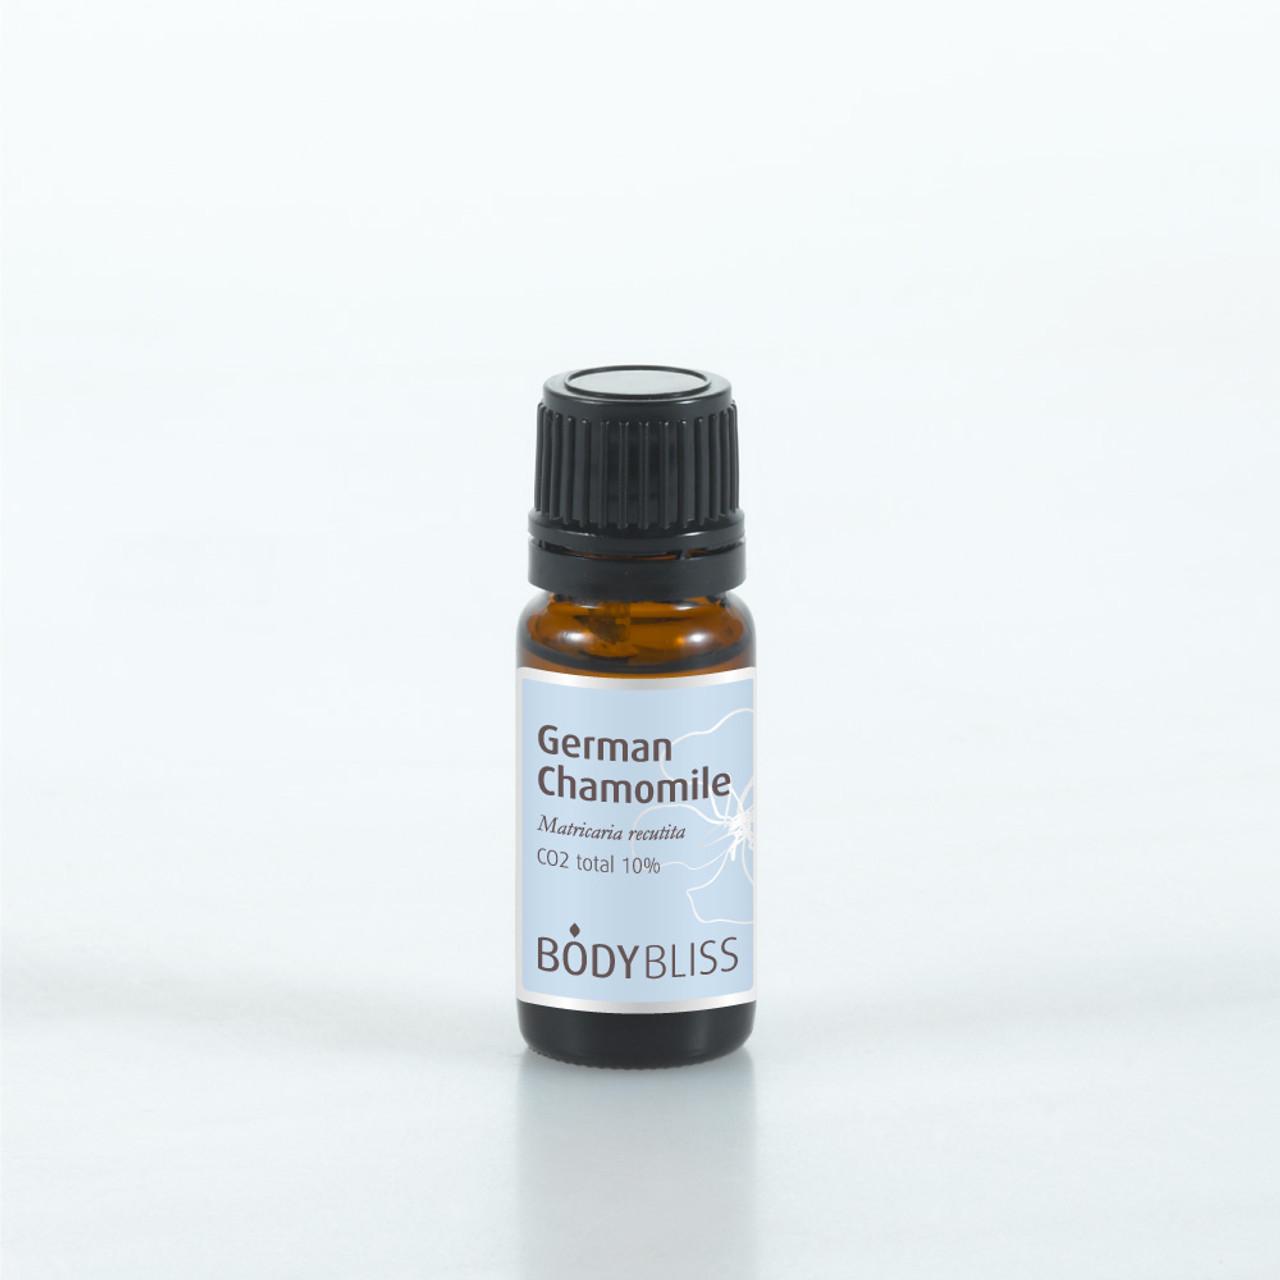 Chamomile, German - 10% in coconut (C02 total)